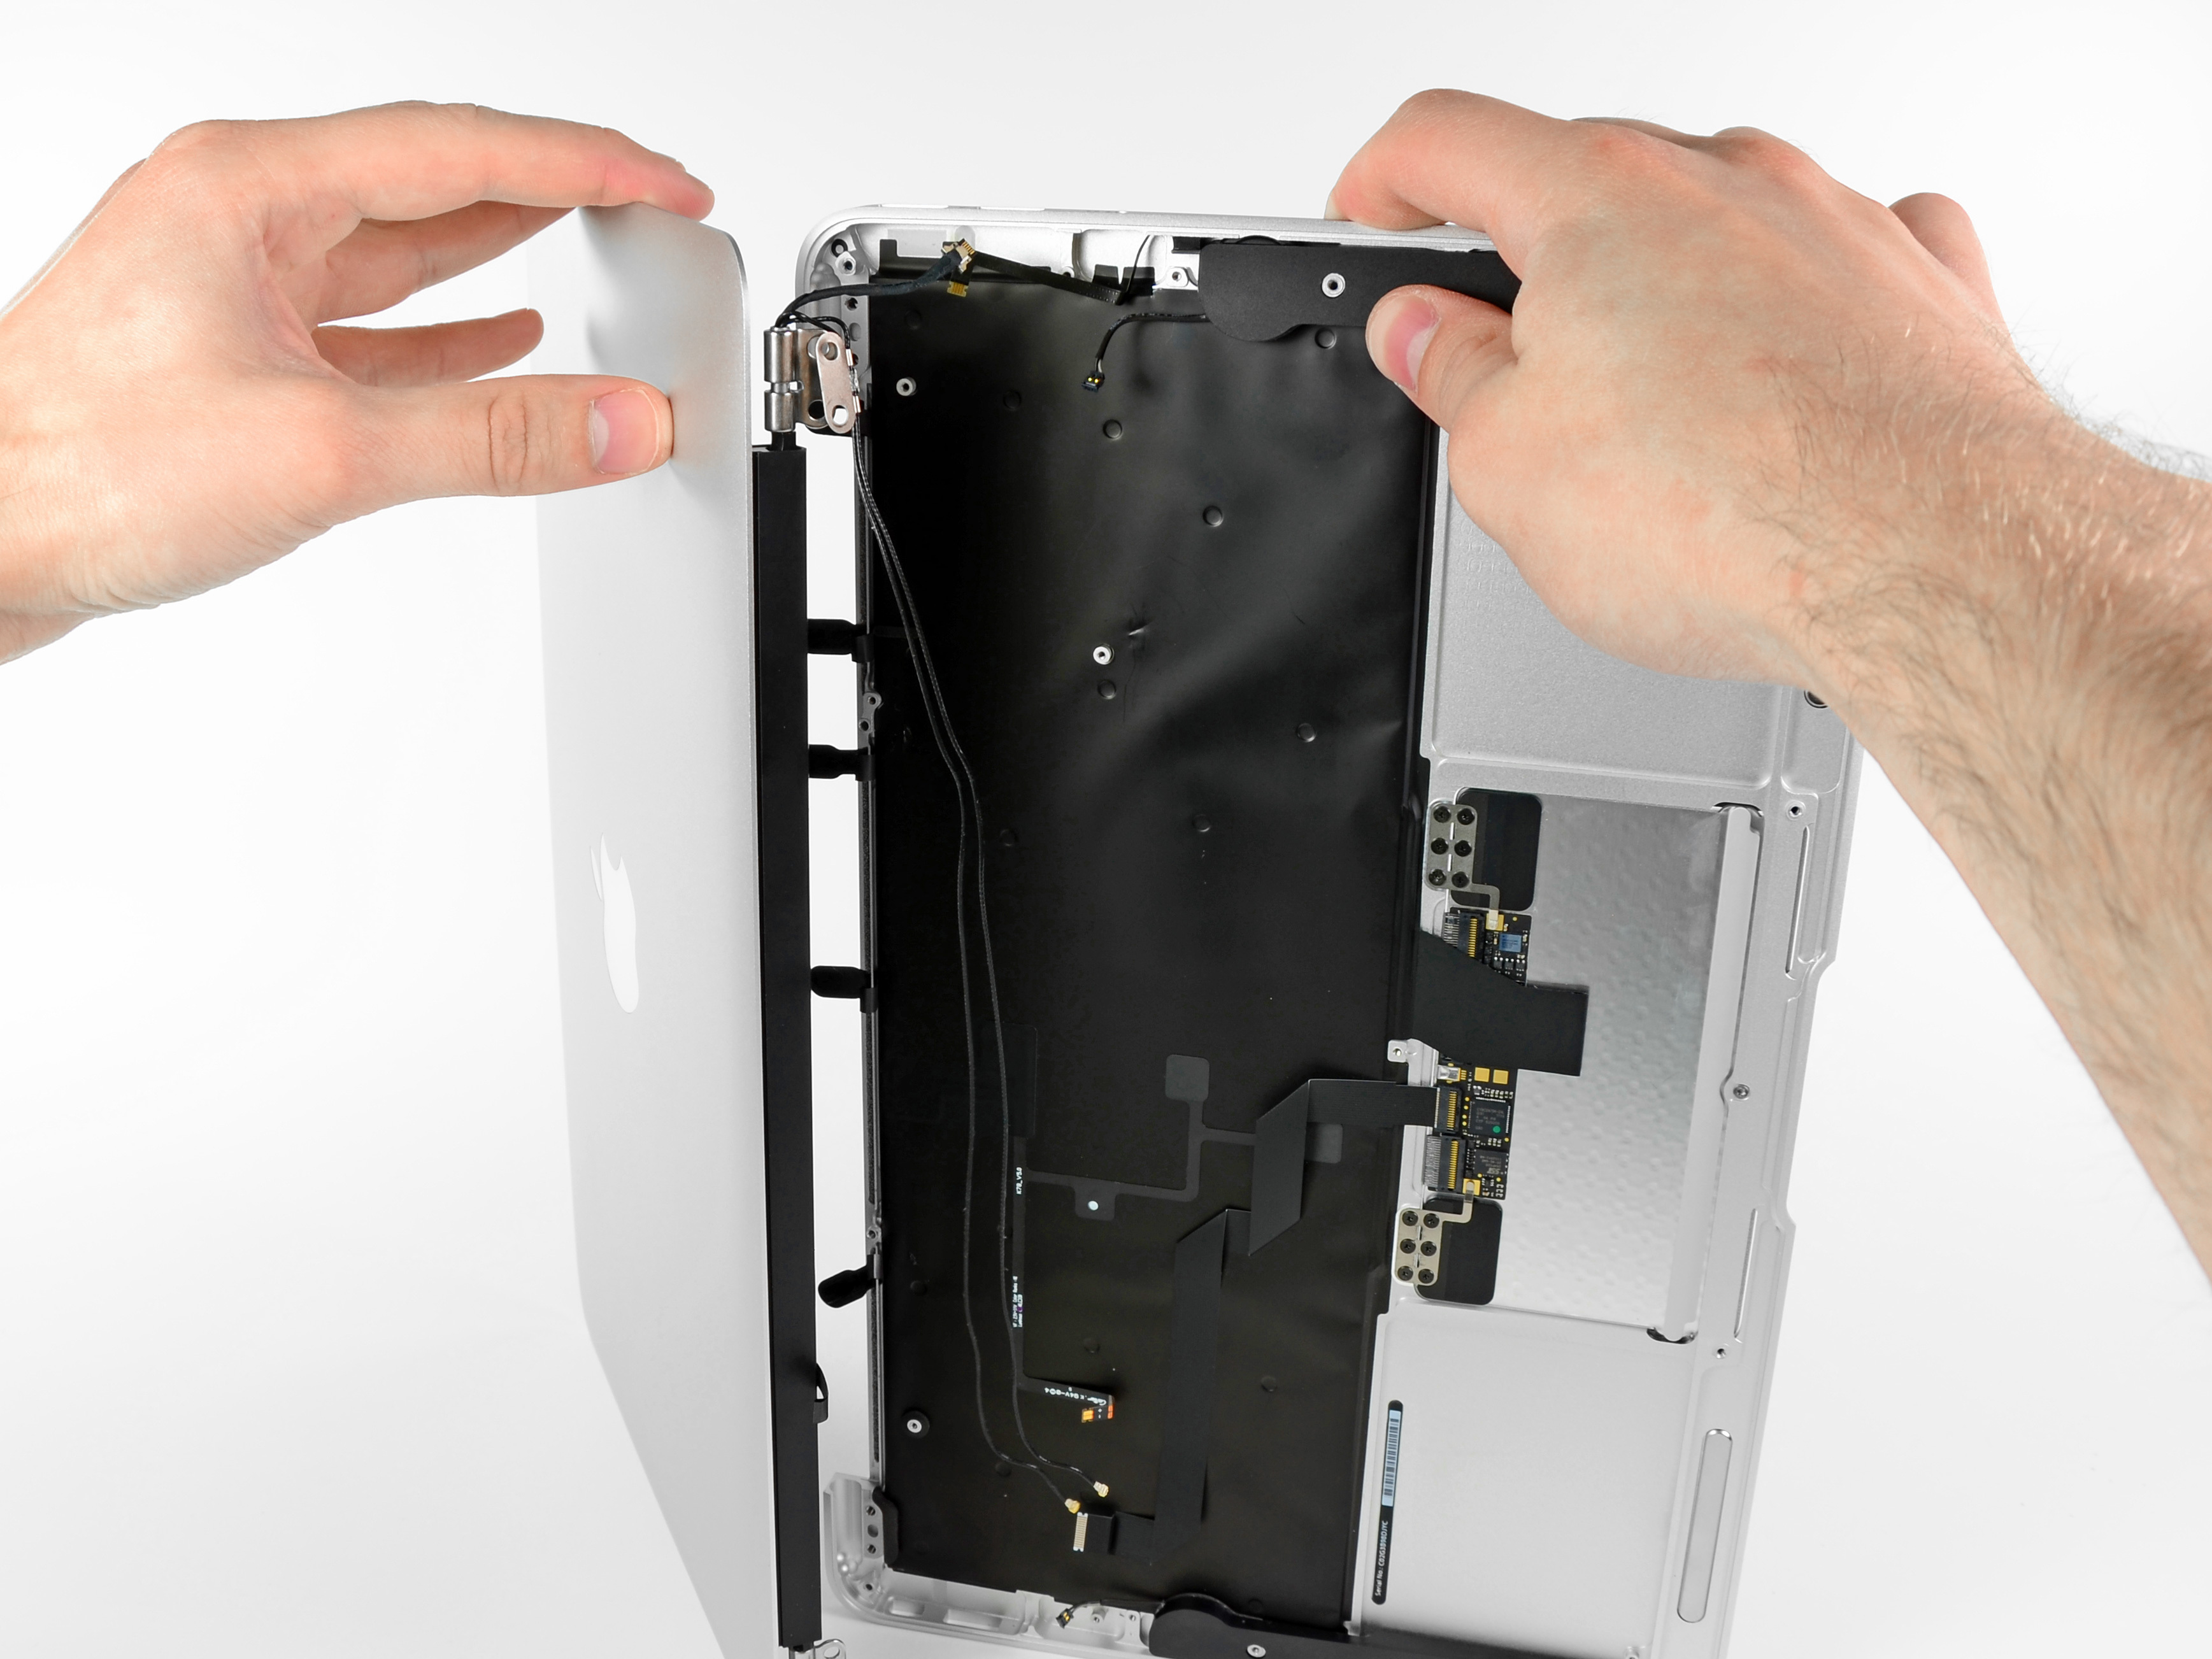 macbook air 11 mid 2012 repair ifixit rh ifixit com macbook air 11 repair manual macbook air 11 repair manual